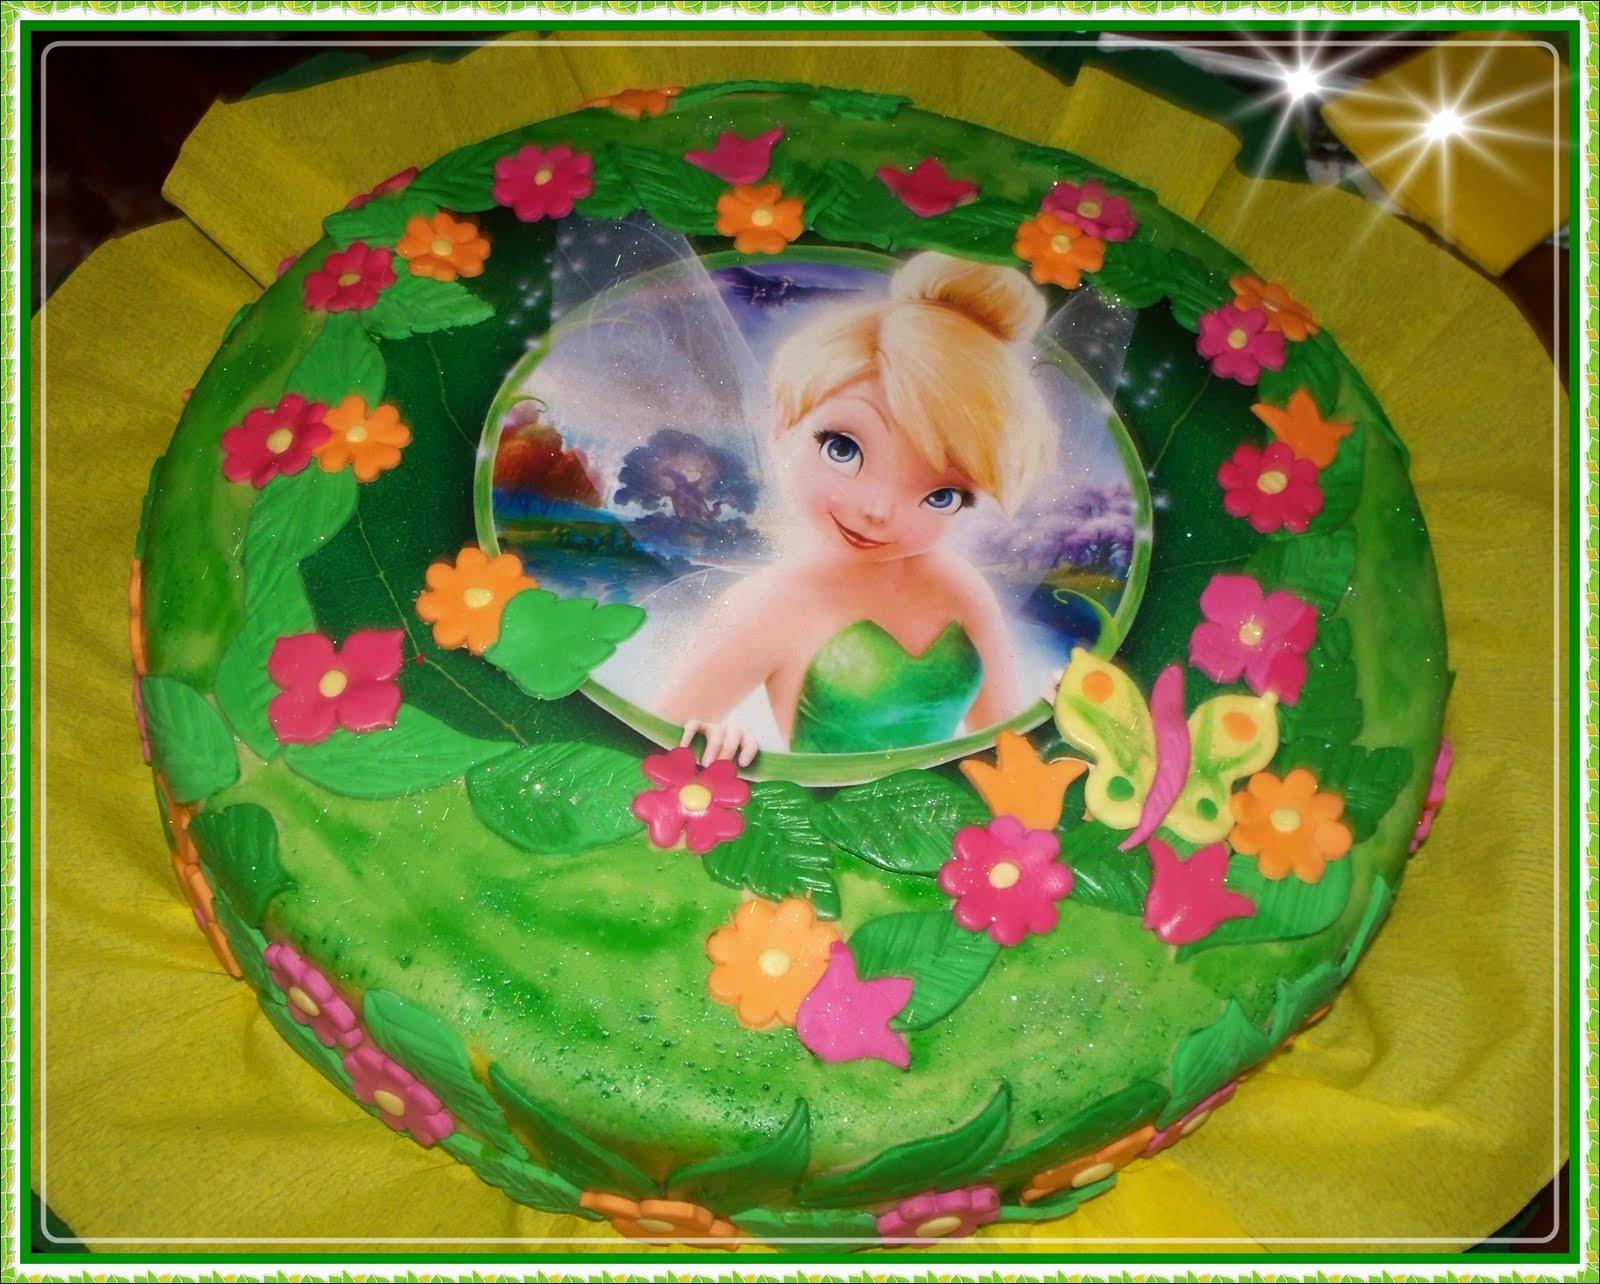 Tortas de cumpleaños de tinkerbell - Imagui